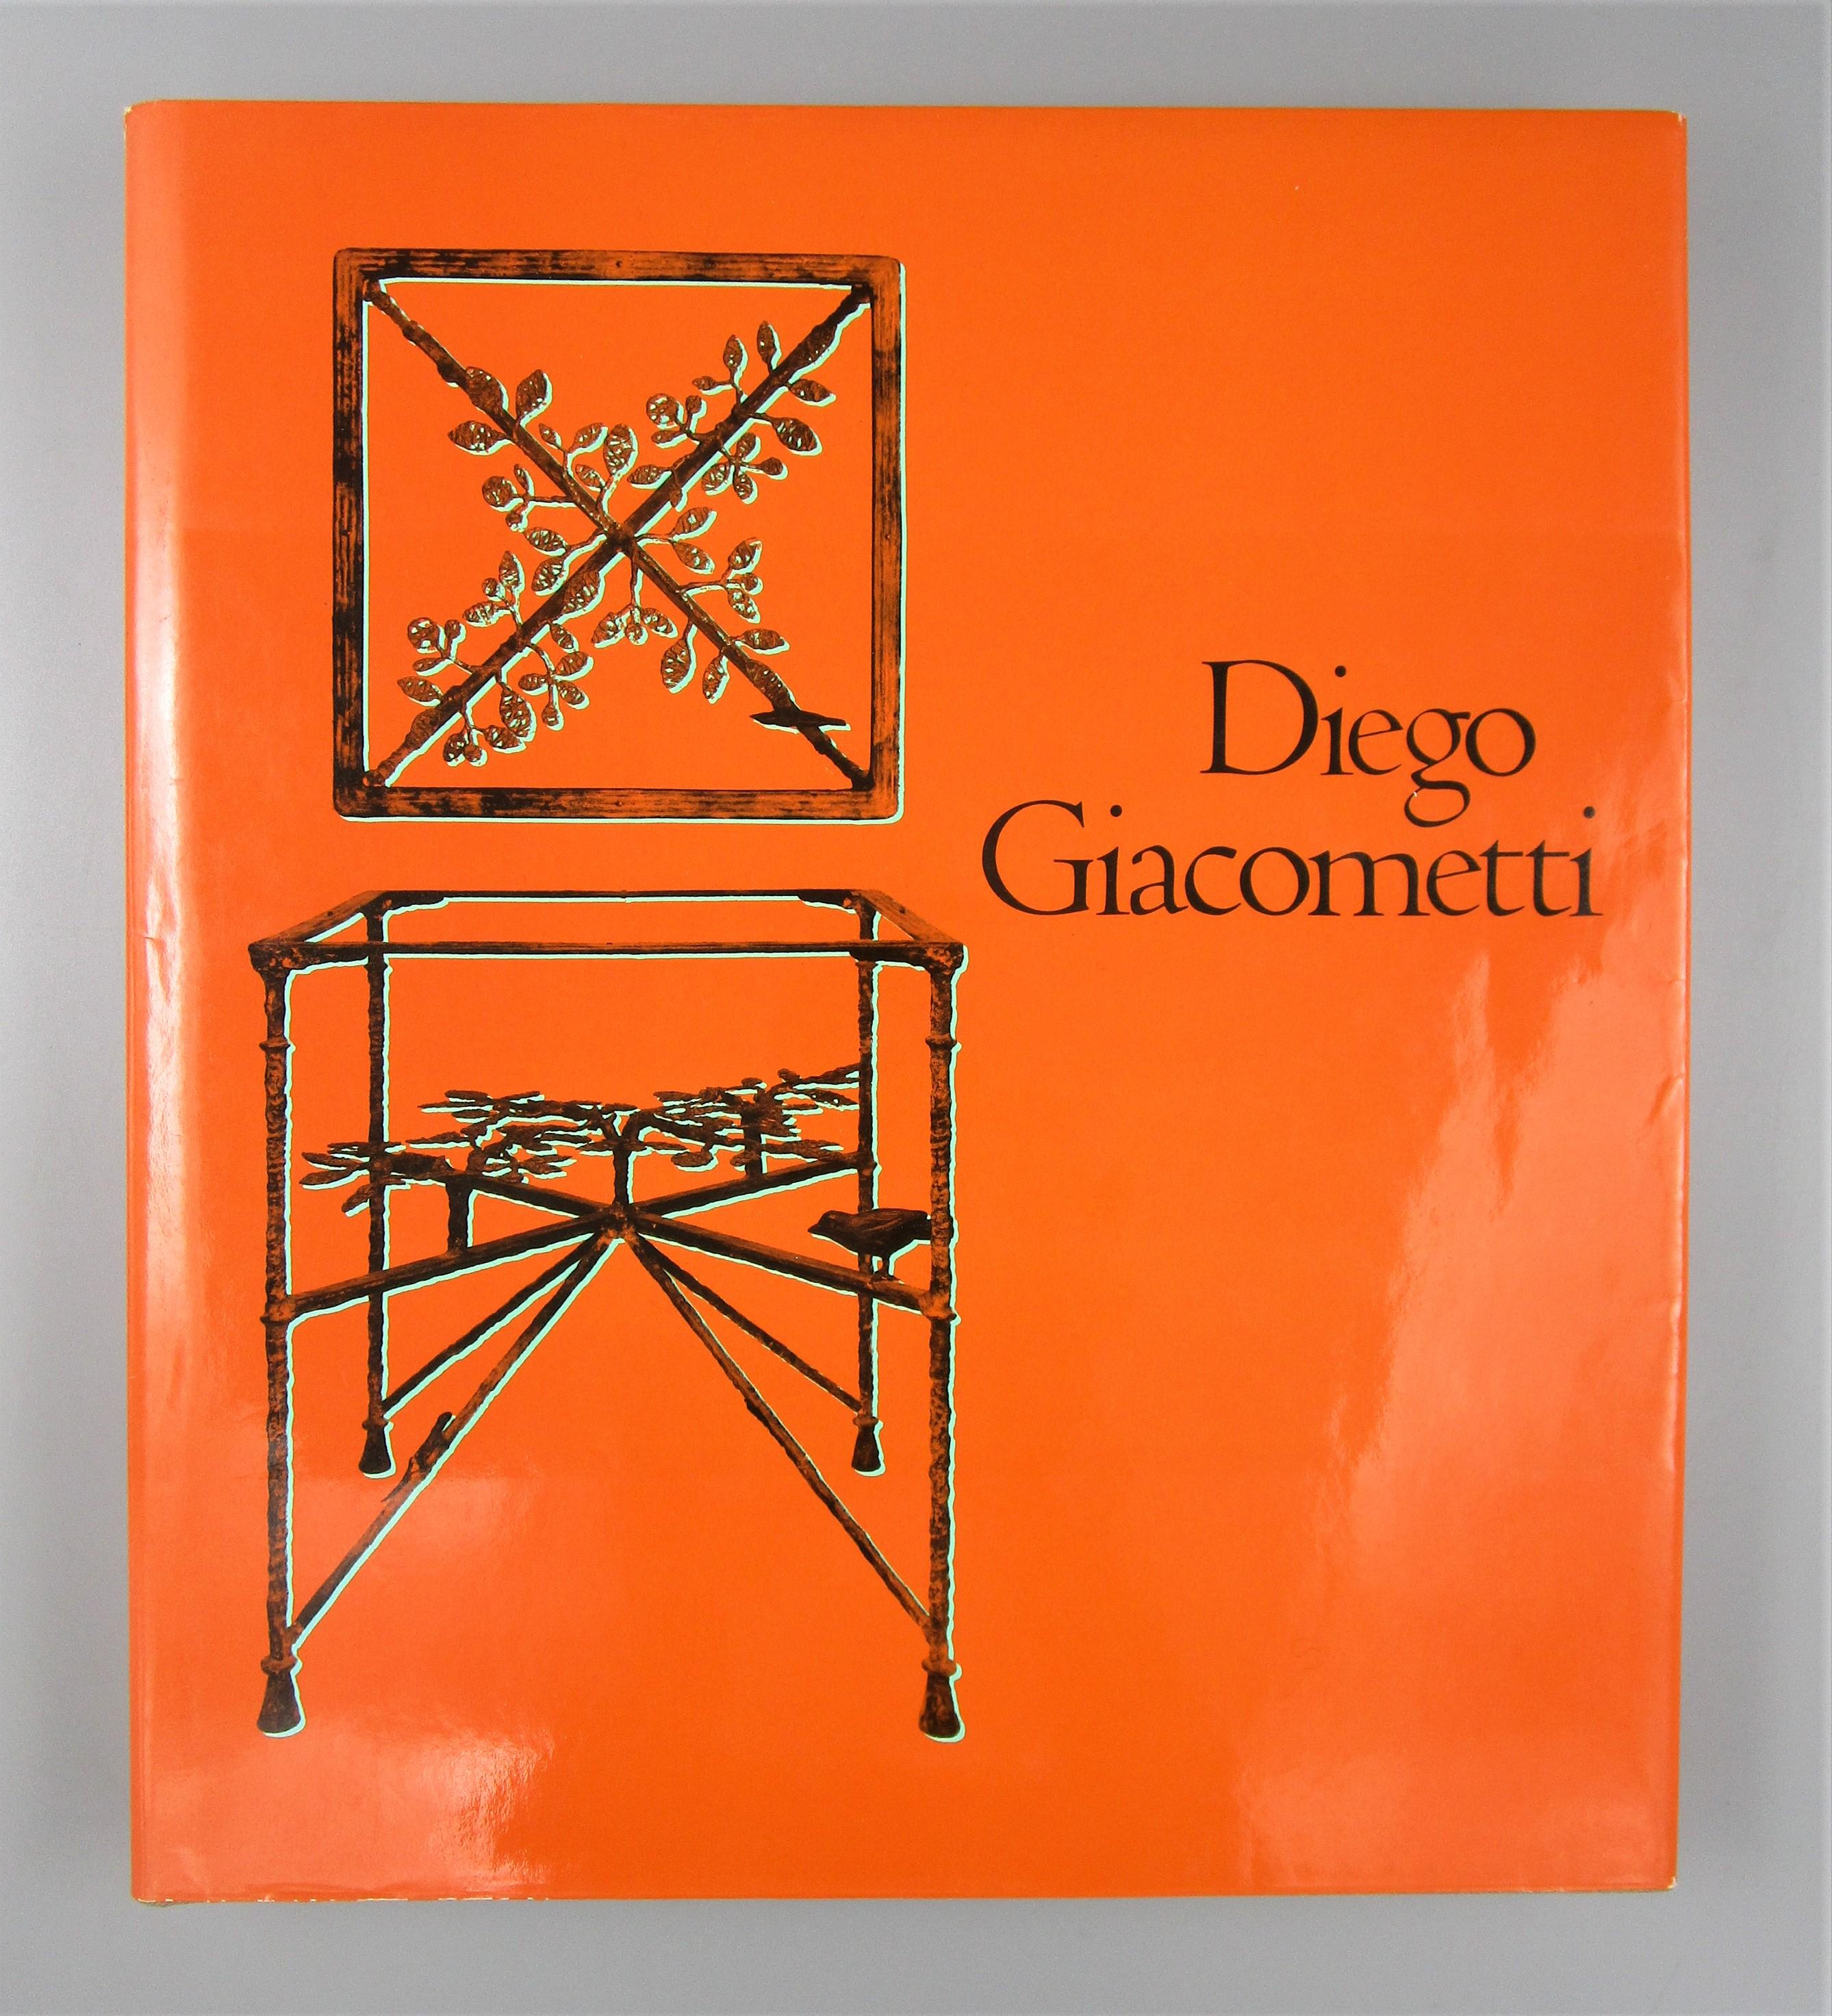 DIEGO GIACOMETTI, by Daniel Marchesseau [1st Ed] - 1986